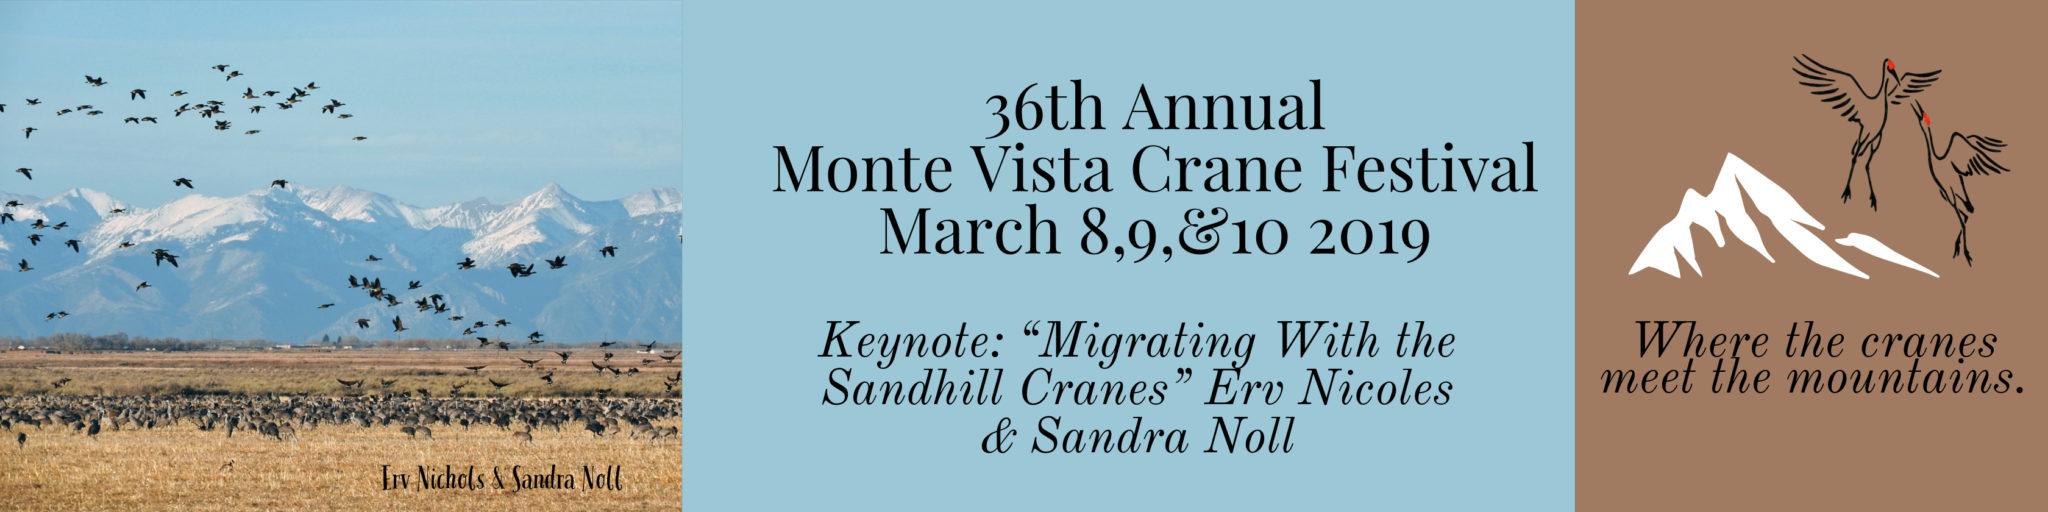 Monte Vista Crane Fest